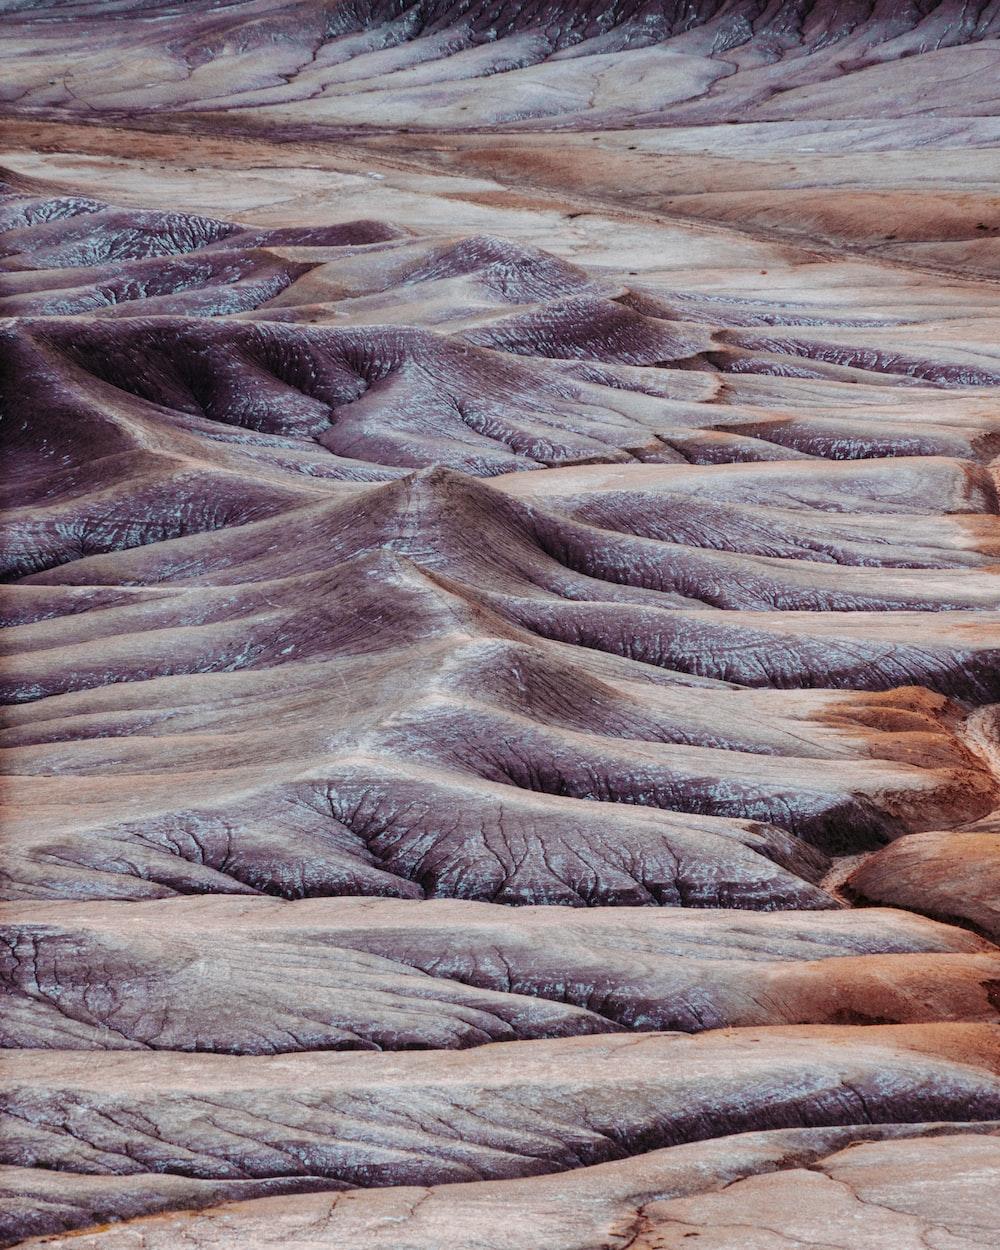 desert photography